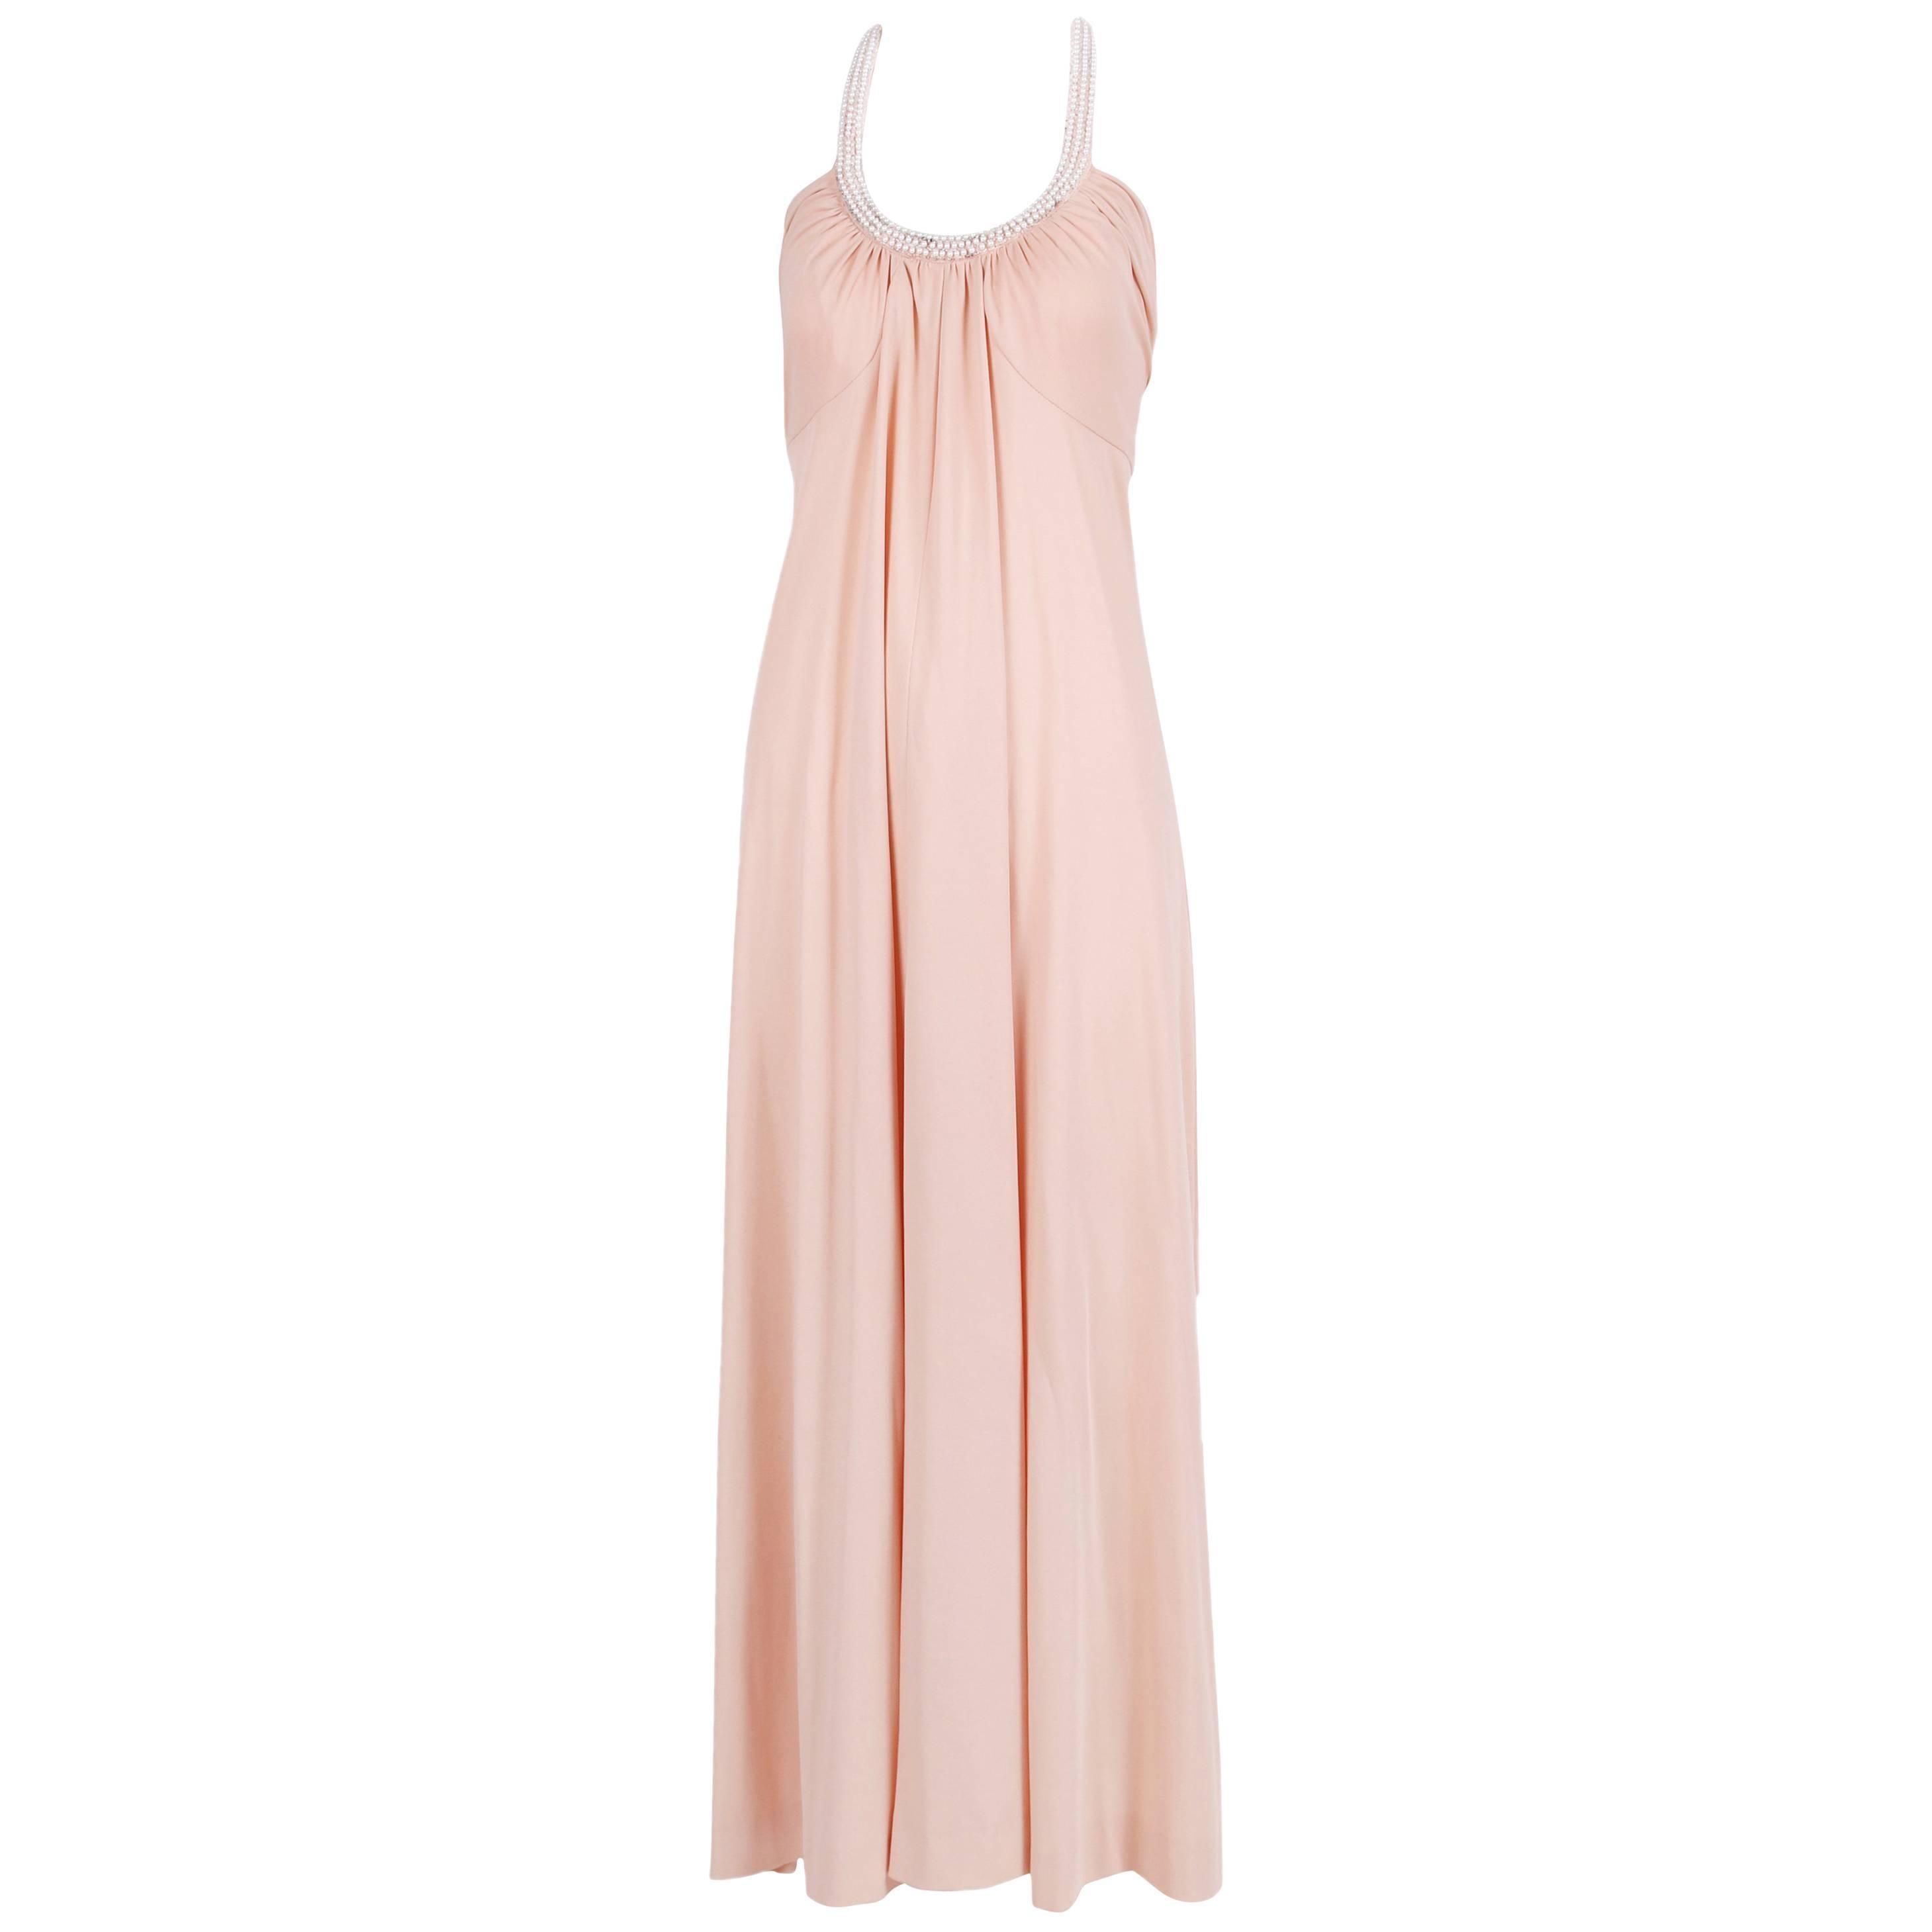 1970's Donald Brooks Blush Pink Jersey Disco Dress w/Pearl Embellished Halter